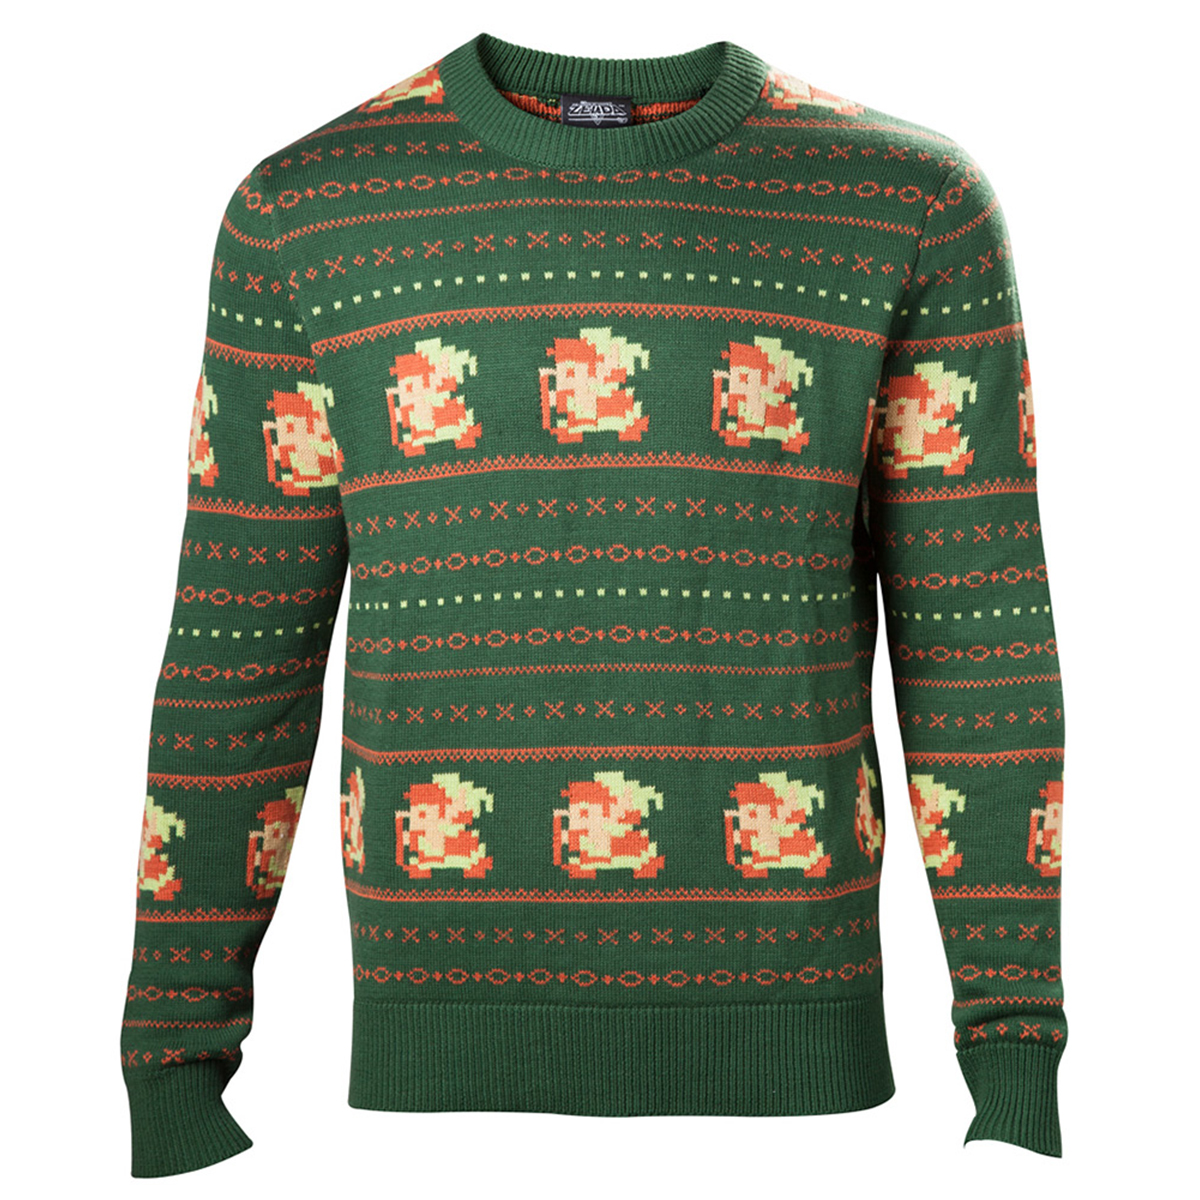 the legend of zelda christmas sweater - Legend Of Zelda Christmas Sweater